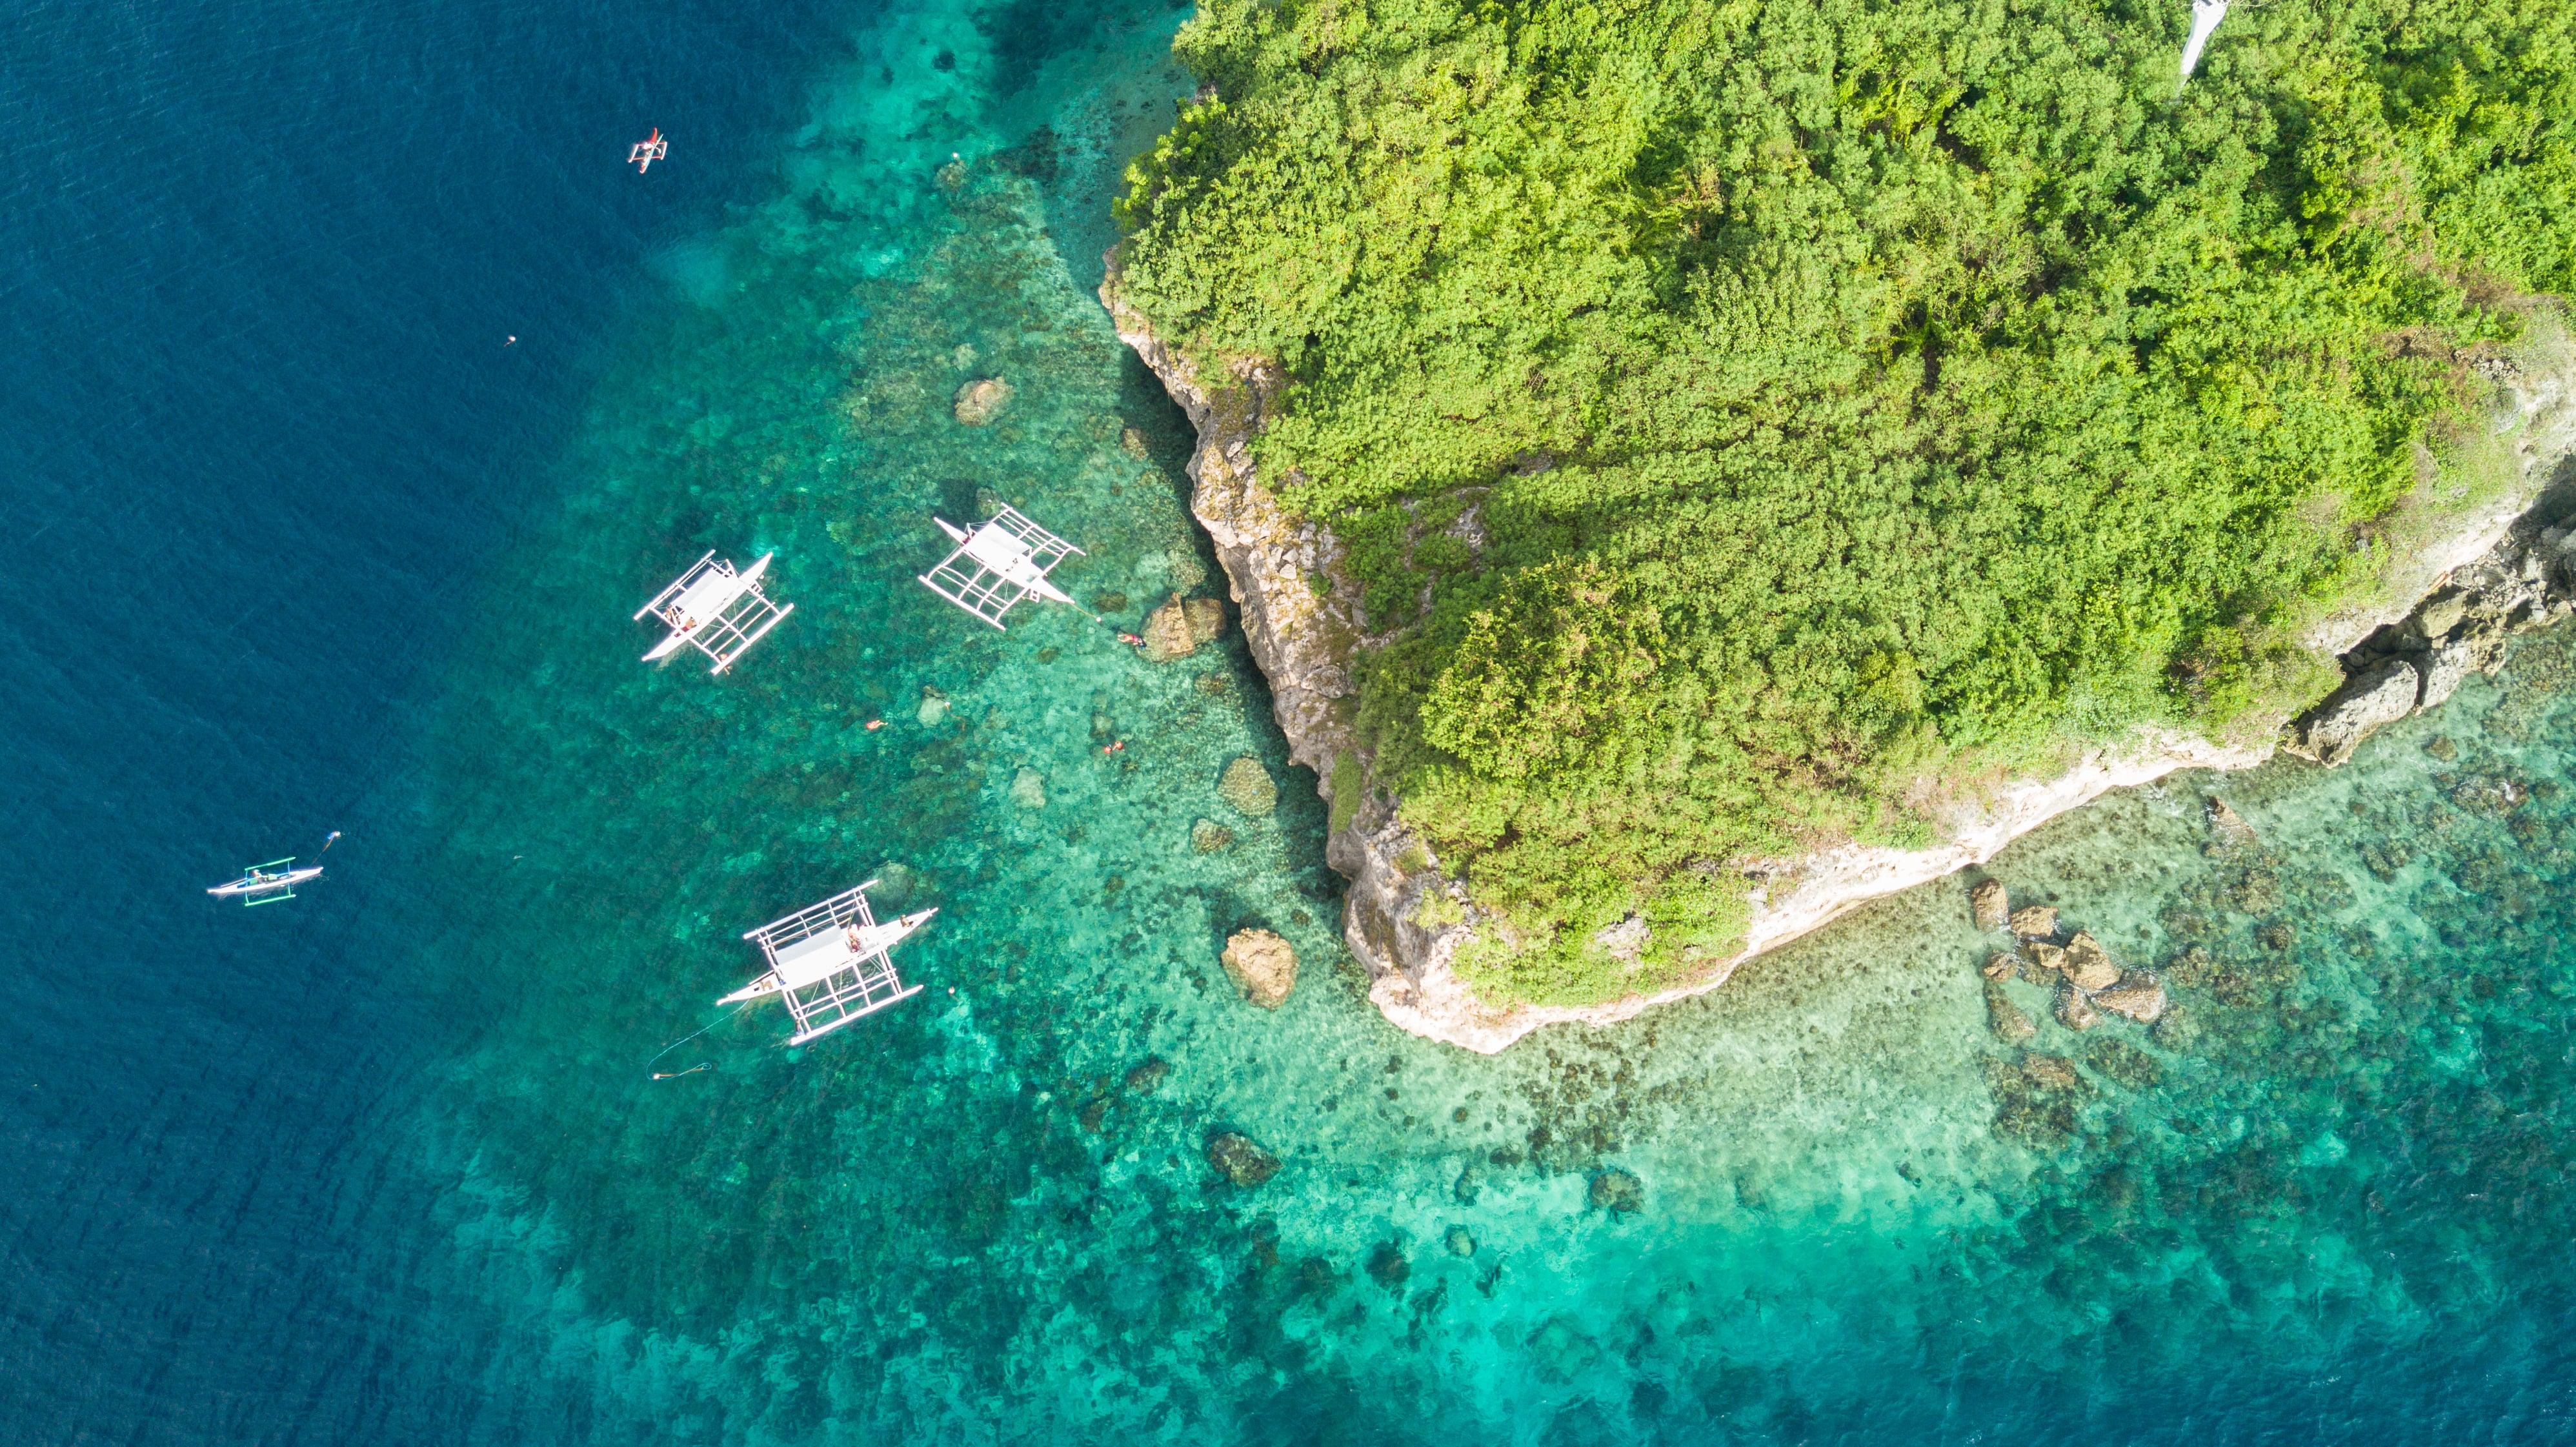 Cebu Pescador Island & Kawasan Falls Private Day Tour with Transfers from Cebu City